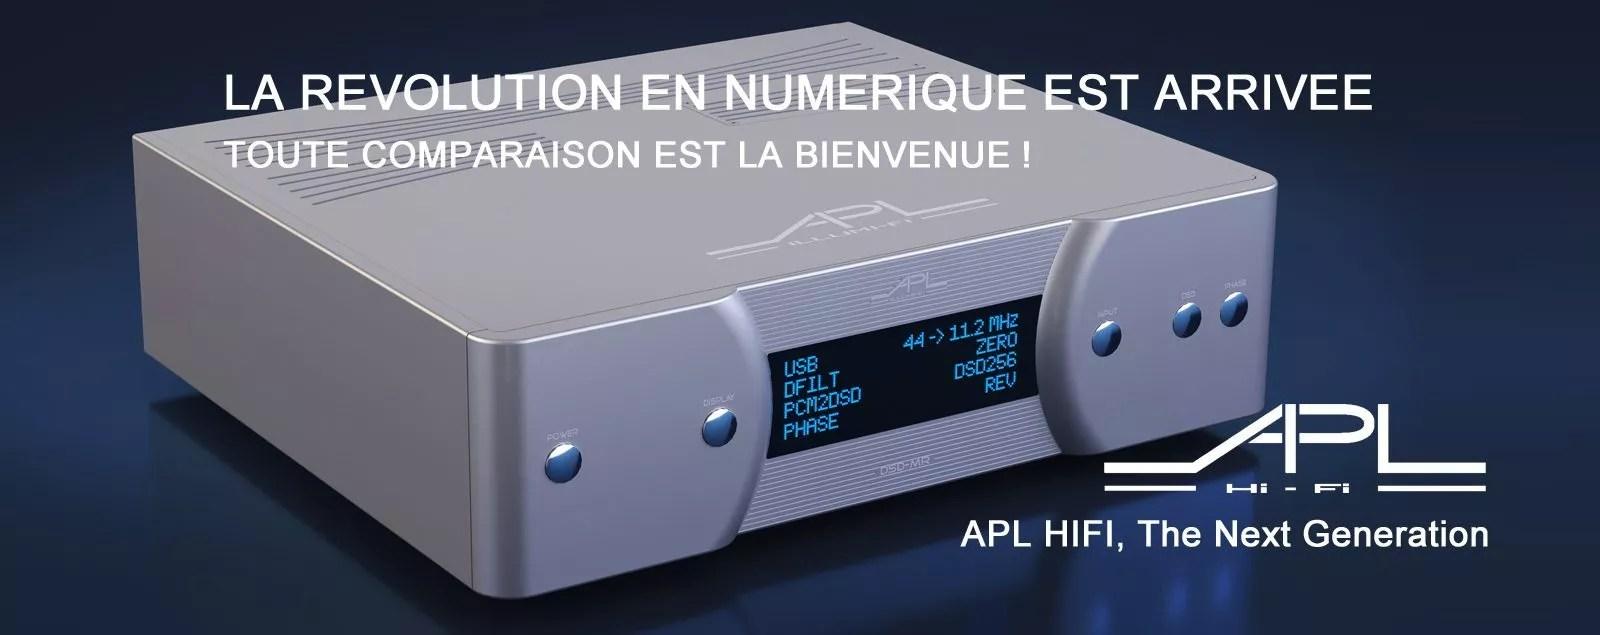 slide-APL-hifi-next-generation